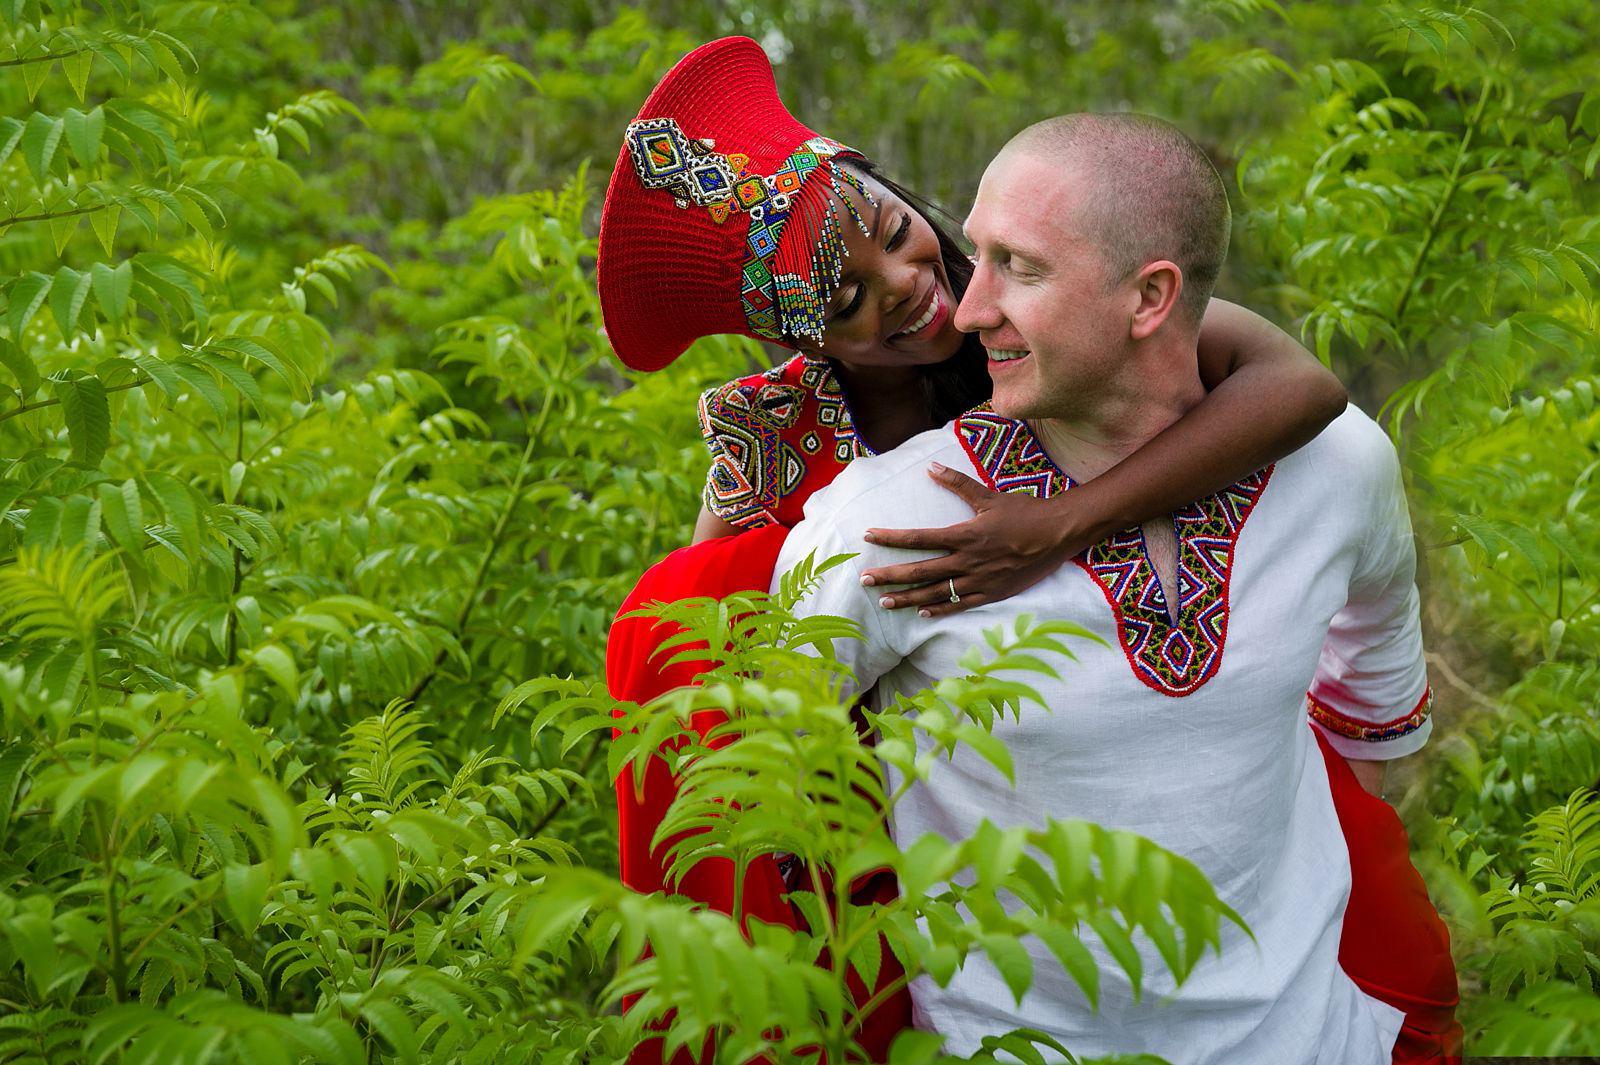 Traditional-Zulu-Wedding-Umhlanga-Top-South-African-Wedding-Photographer-Jacki-Bruniquel-001-